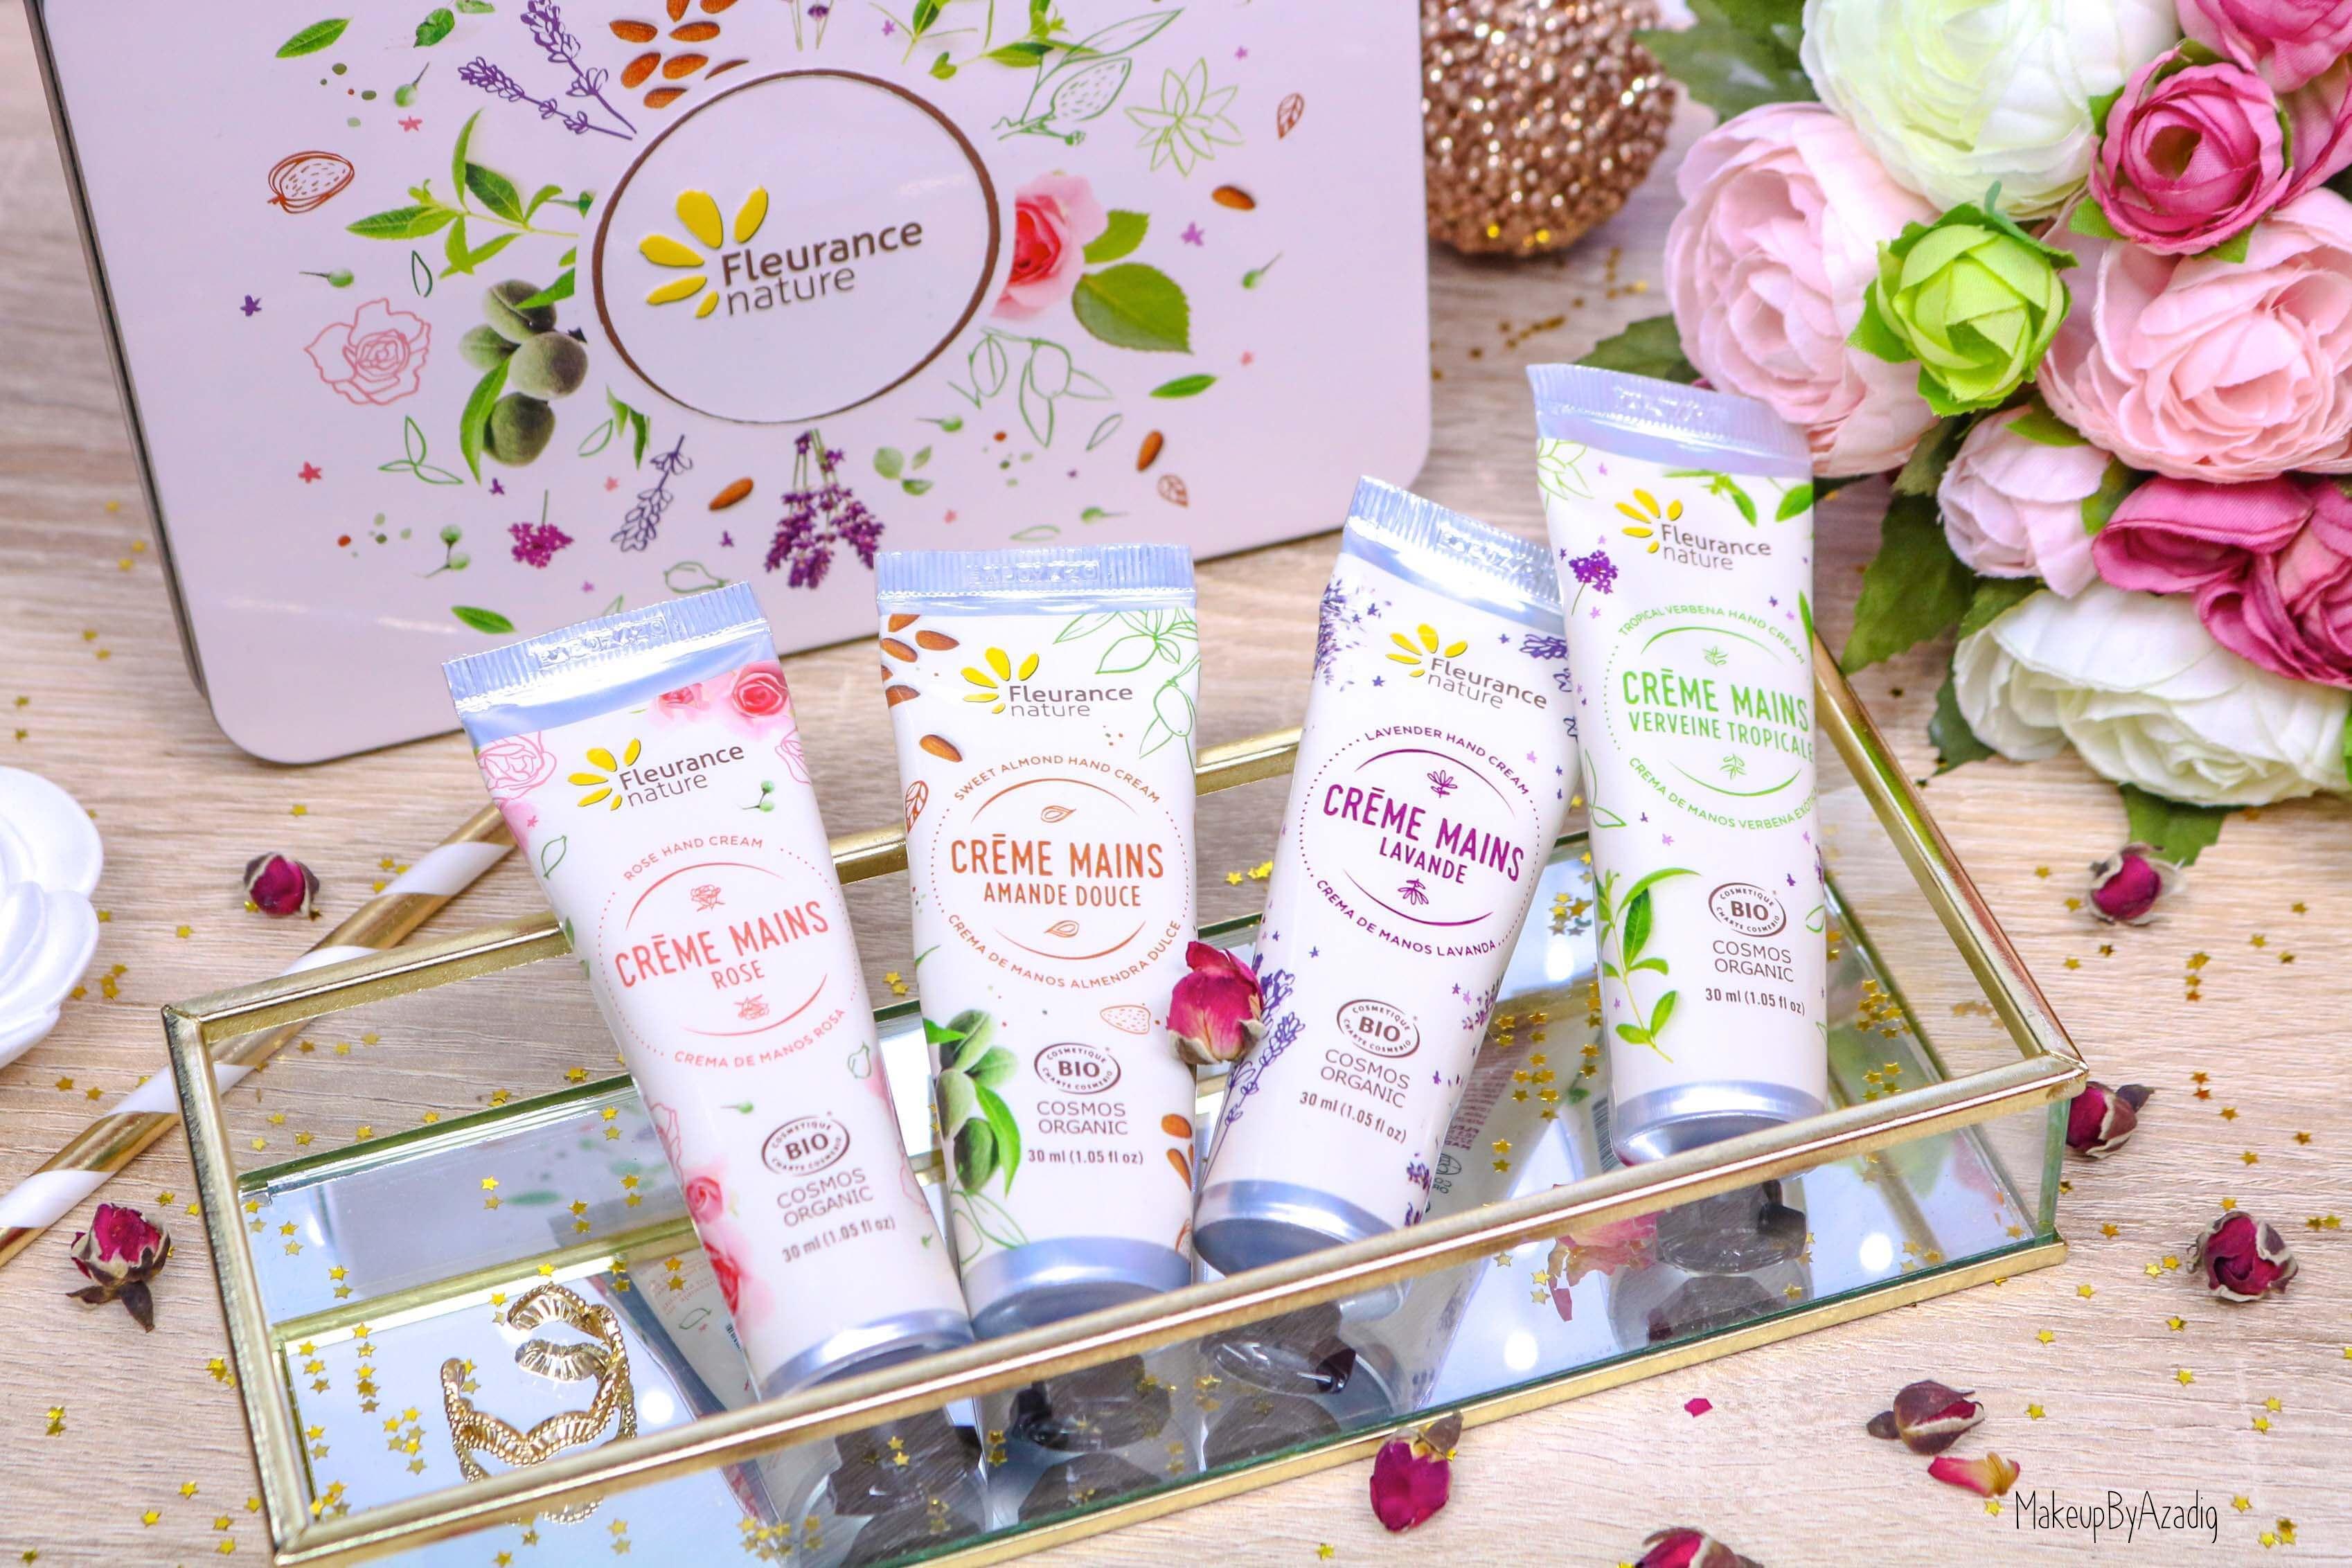 revue-creme-hydratante-reparatrice-mains-hand-bio-beaute-fleurance-nature-makeupbyazadig-verveine-lavande-rose-amande-nature